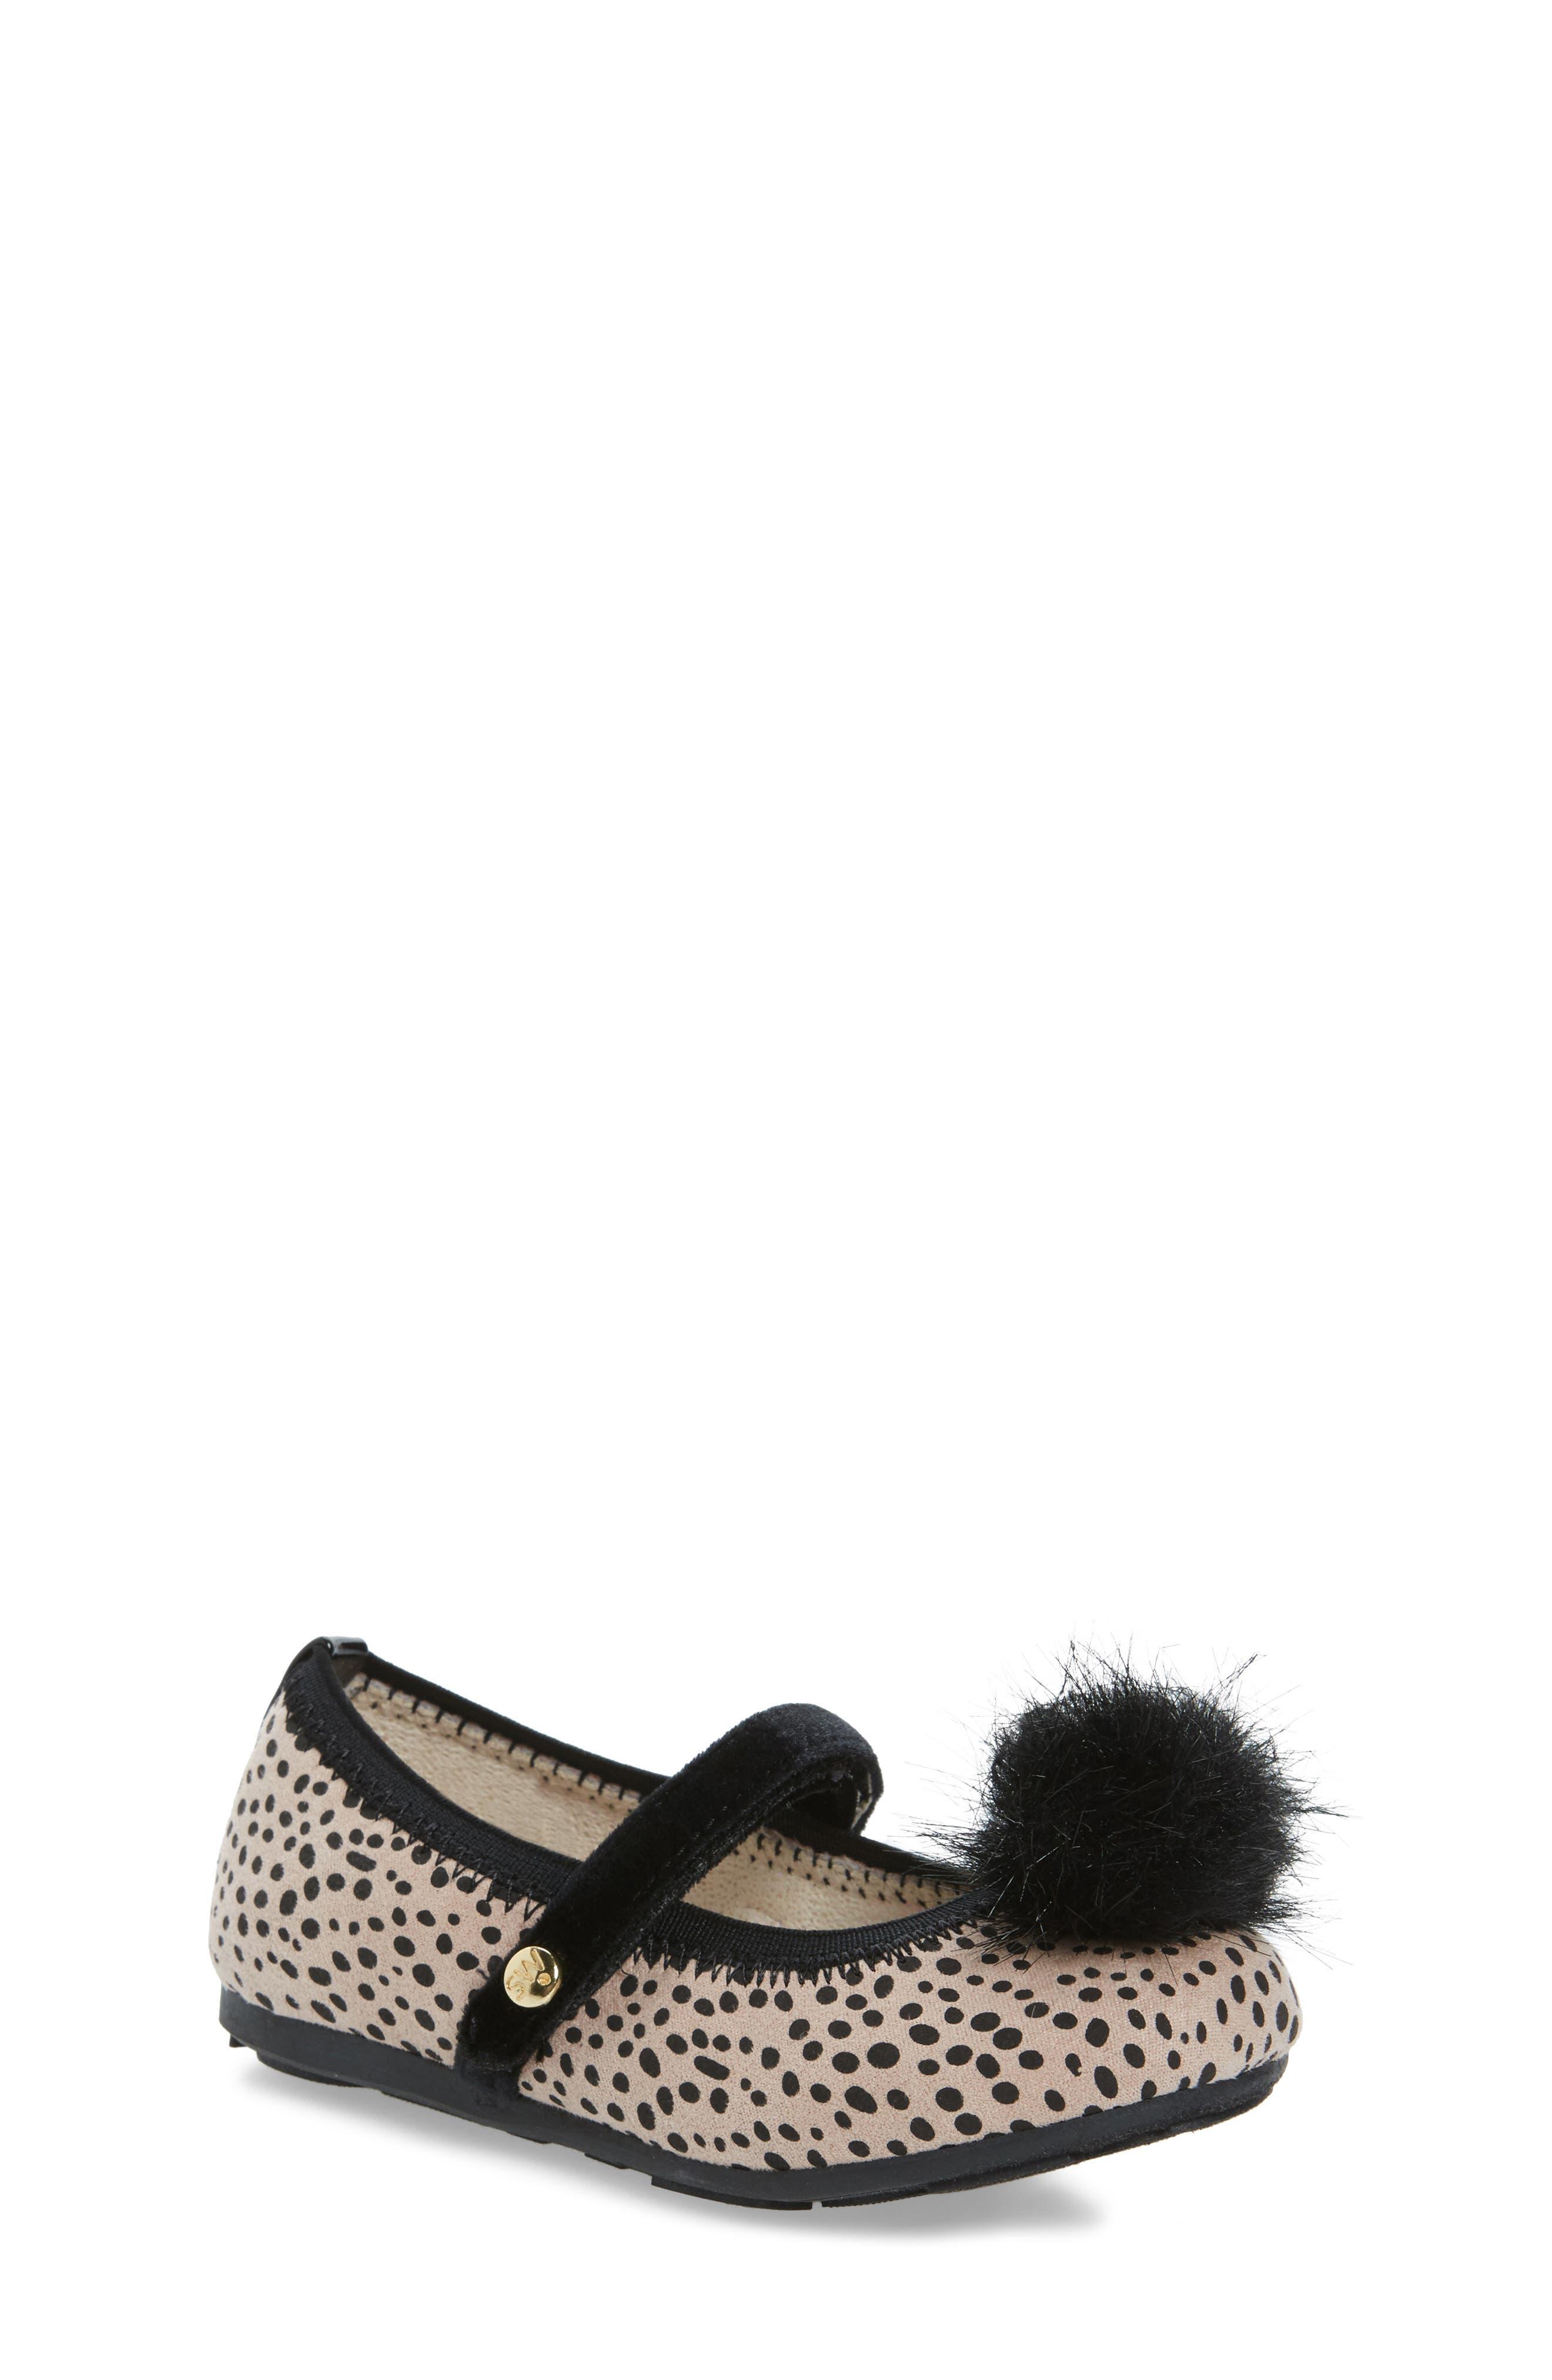 Stuart Weitzman Fannie Cheetah Faux Fur Mary Jane (Walker & Toddler)